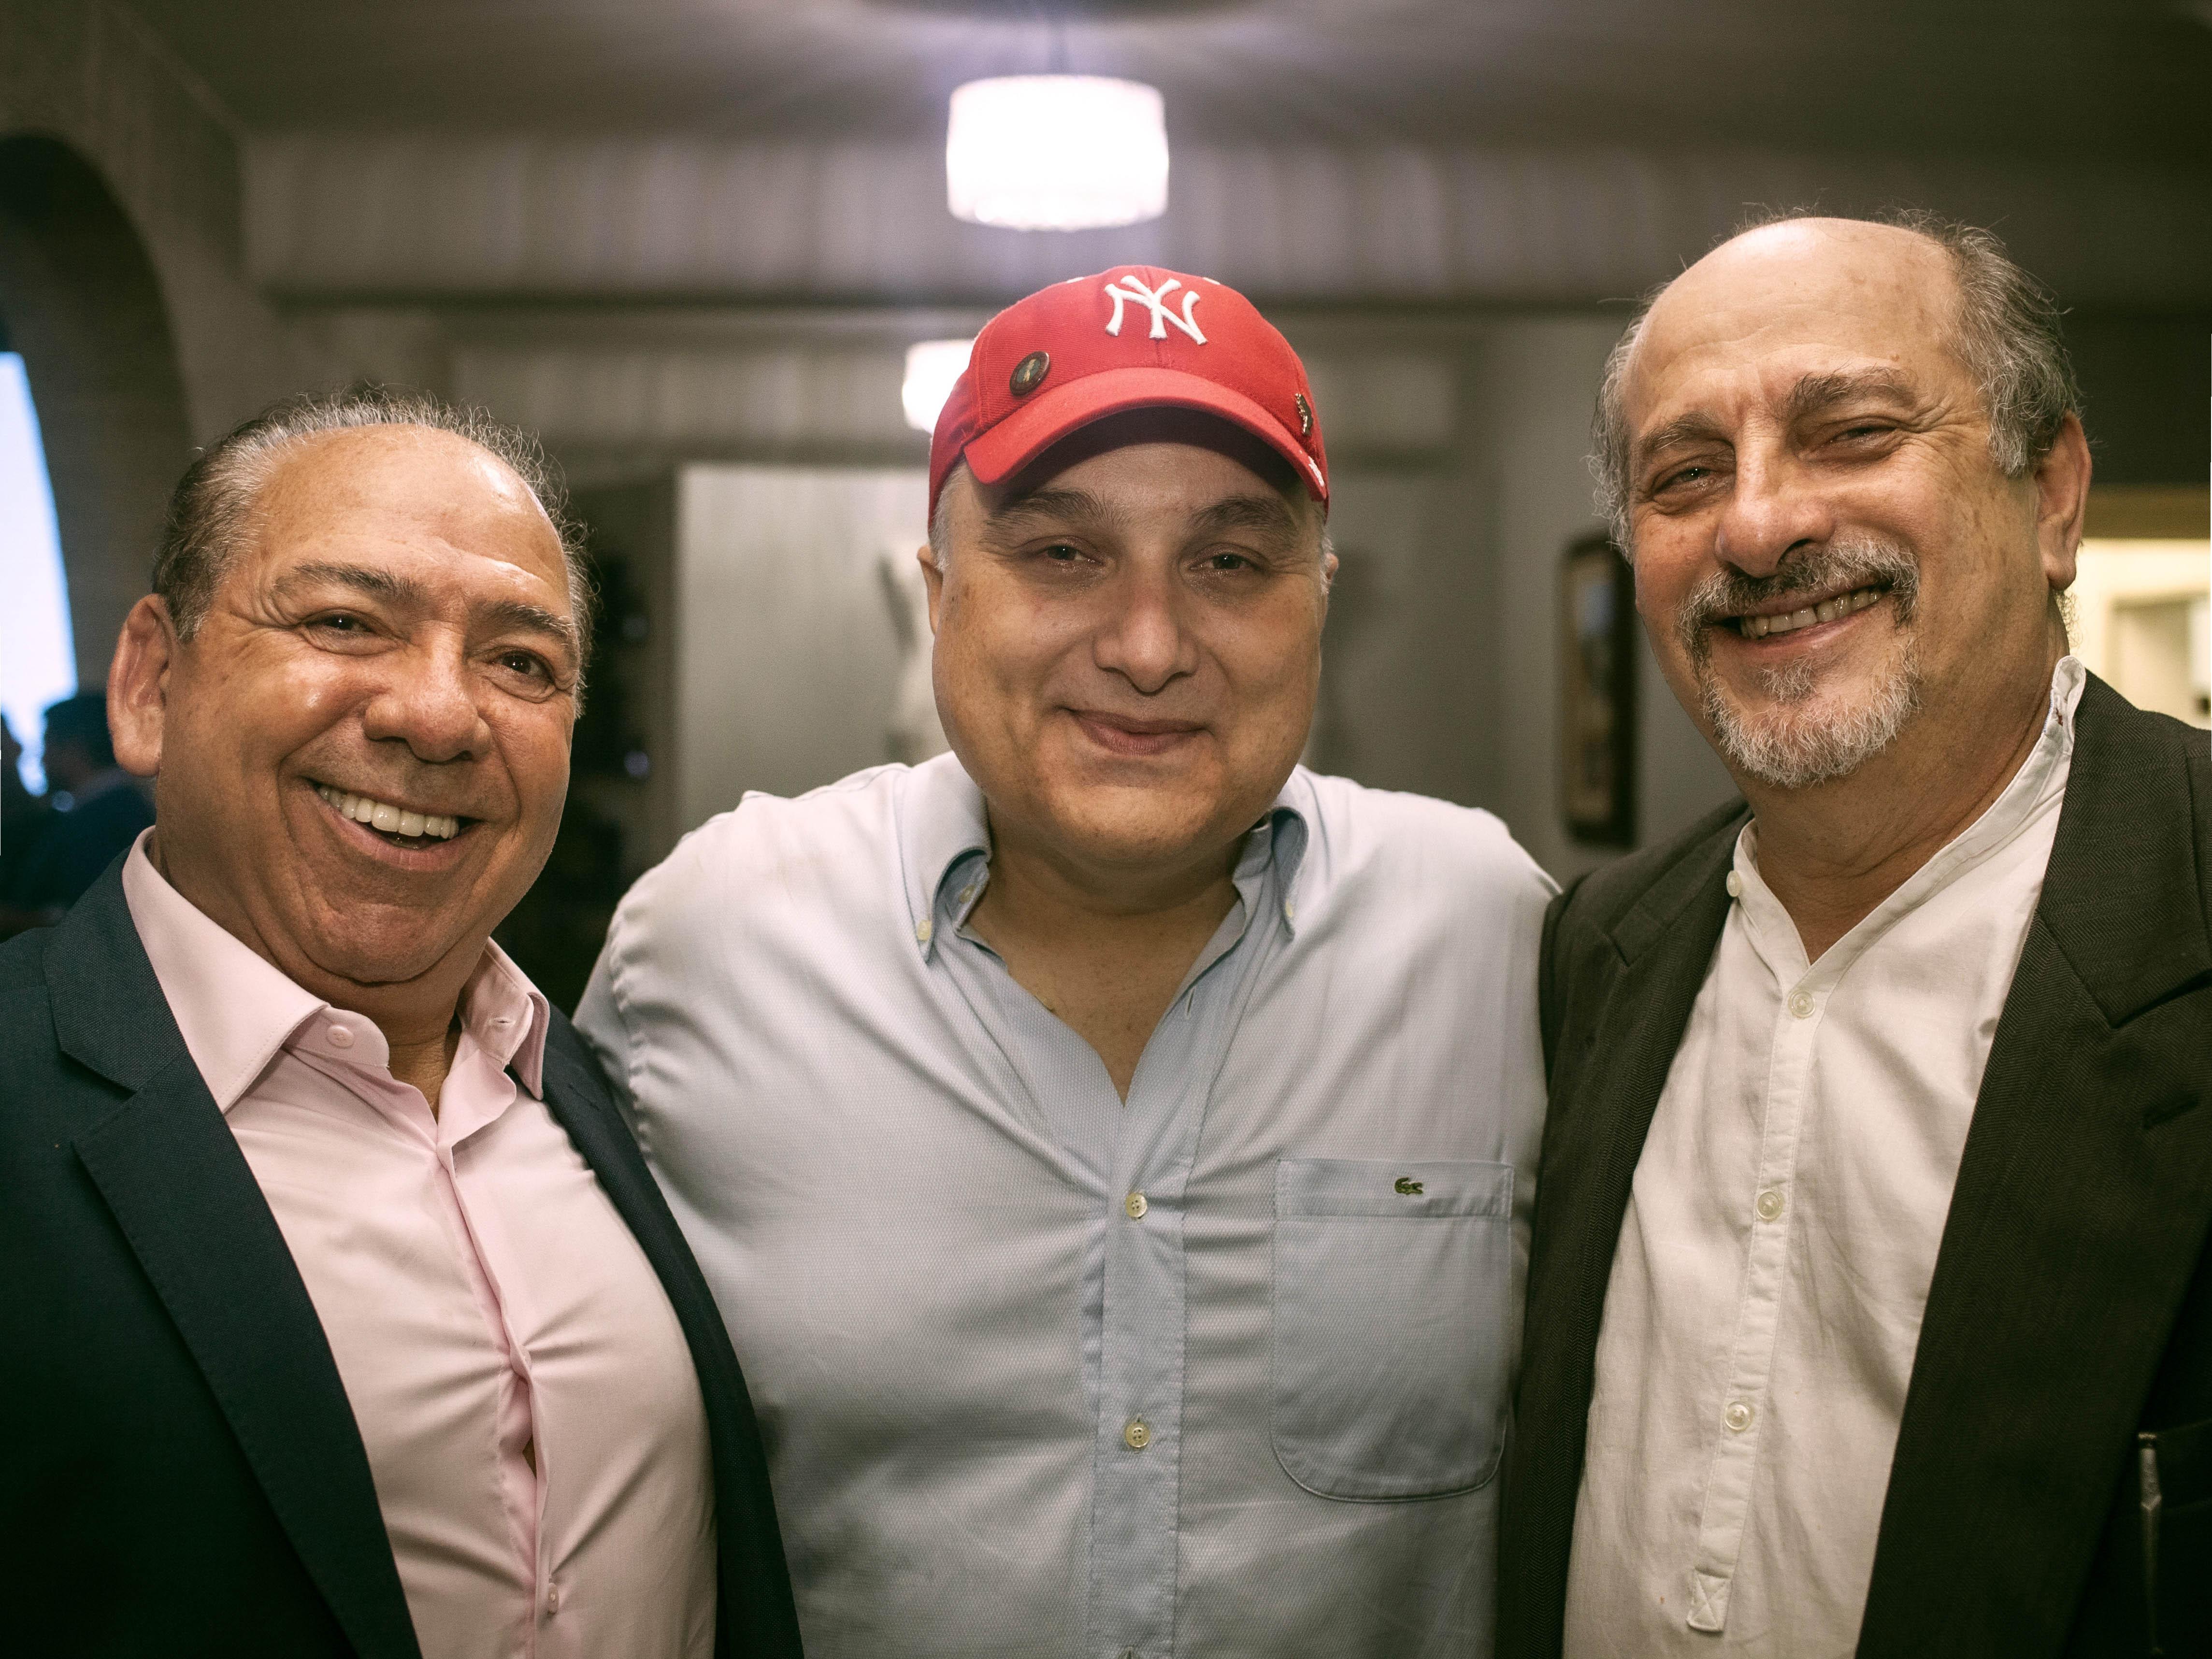 Ramon entre Maely Coelho e Assis Teixeira. Fotos: Rodger Savaris